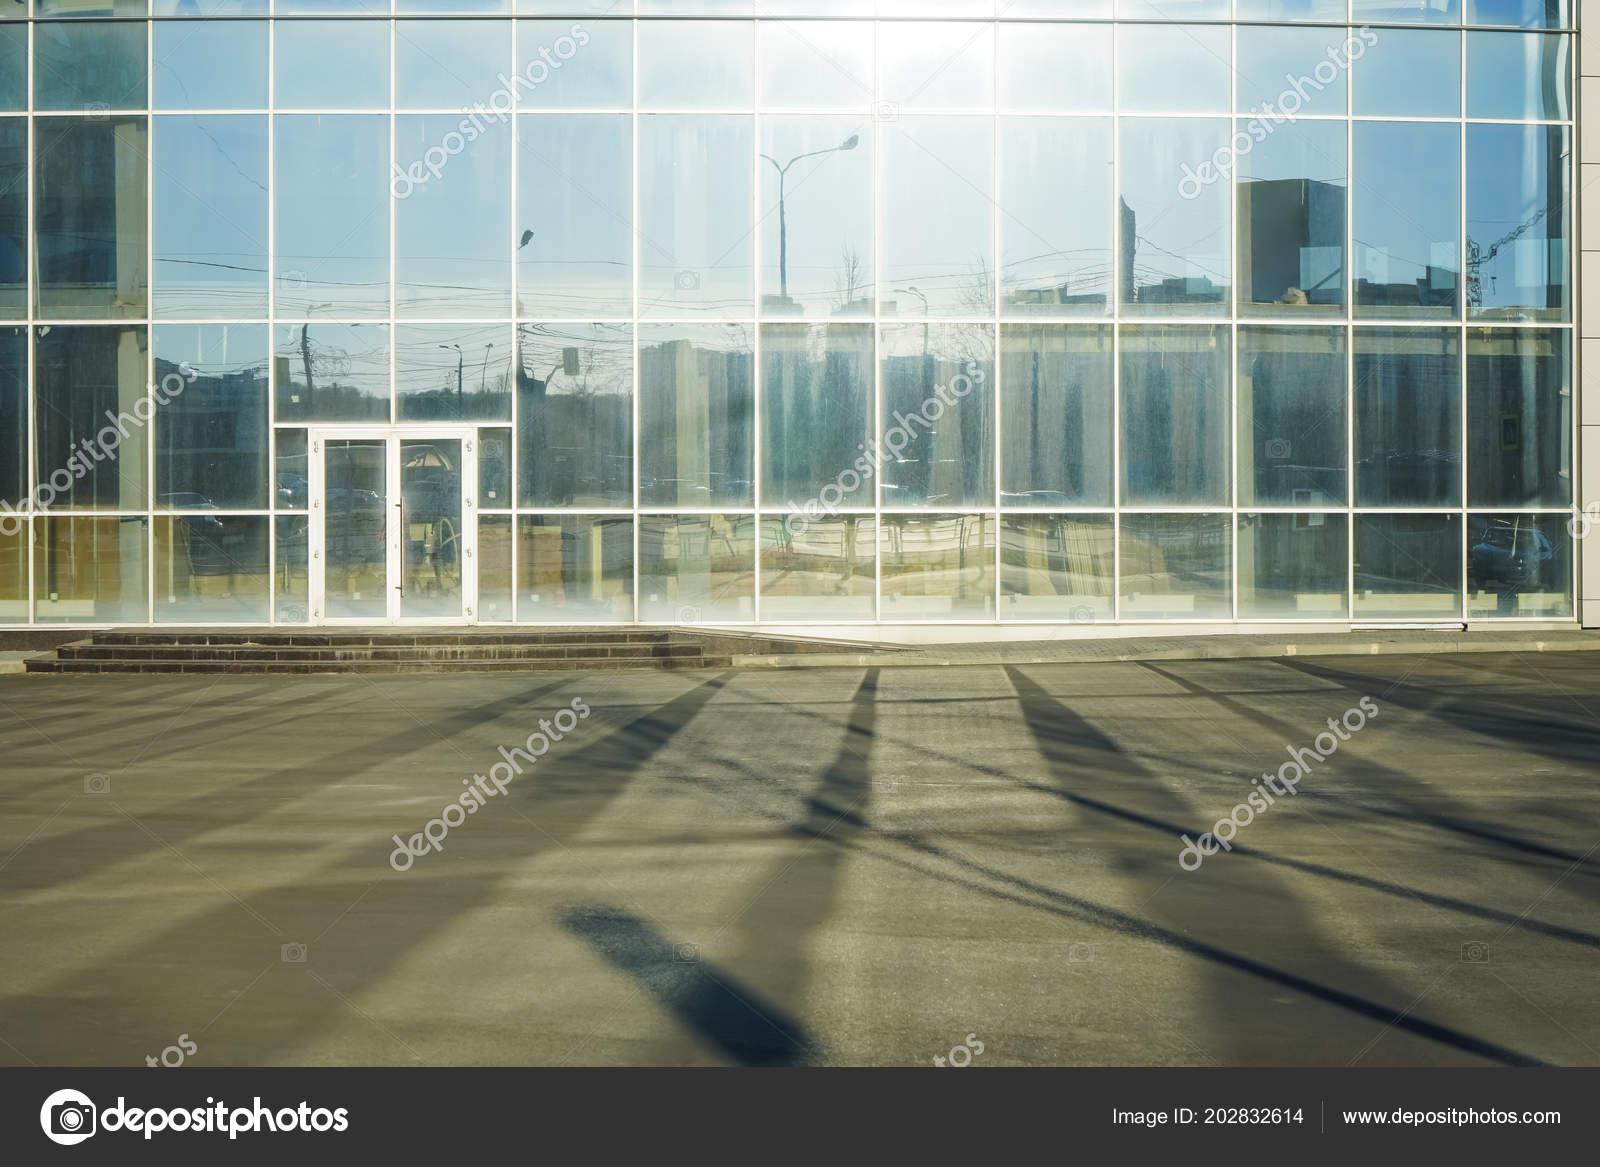 Big Modern Skyscraper Office Building Transparent Glass Exterior Wall Stock Photo Image By C Borjomi88 202832614